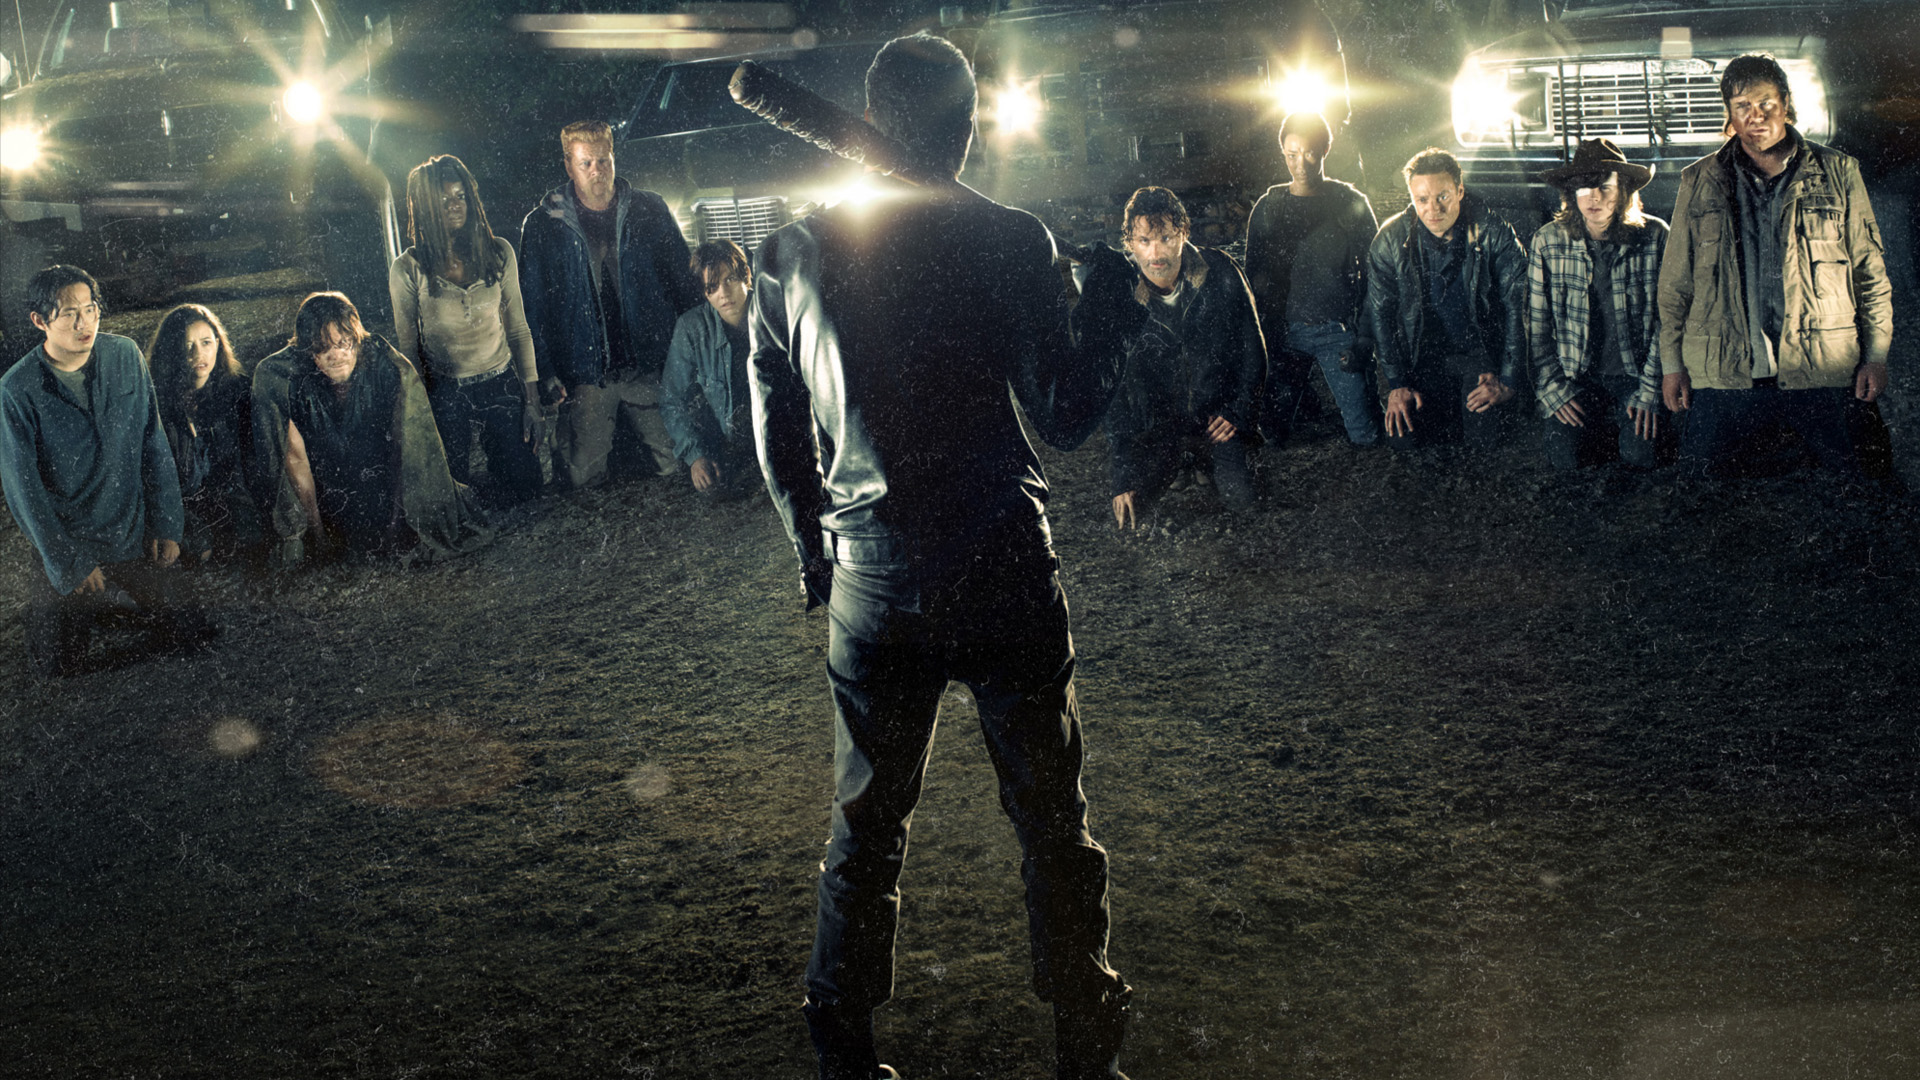 Amc Announces 88 Episode Marathon Of The Walking Dead Geektyrant